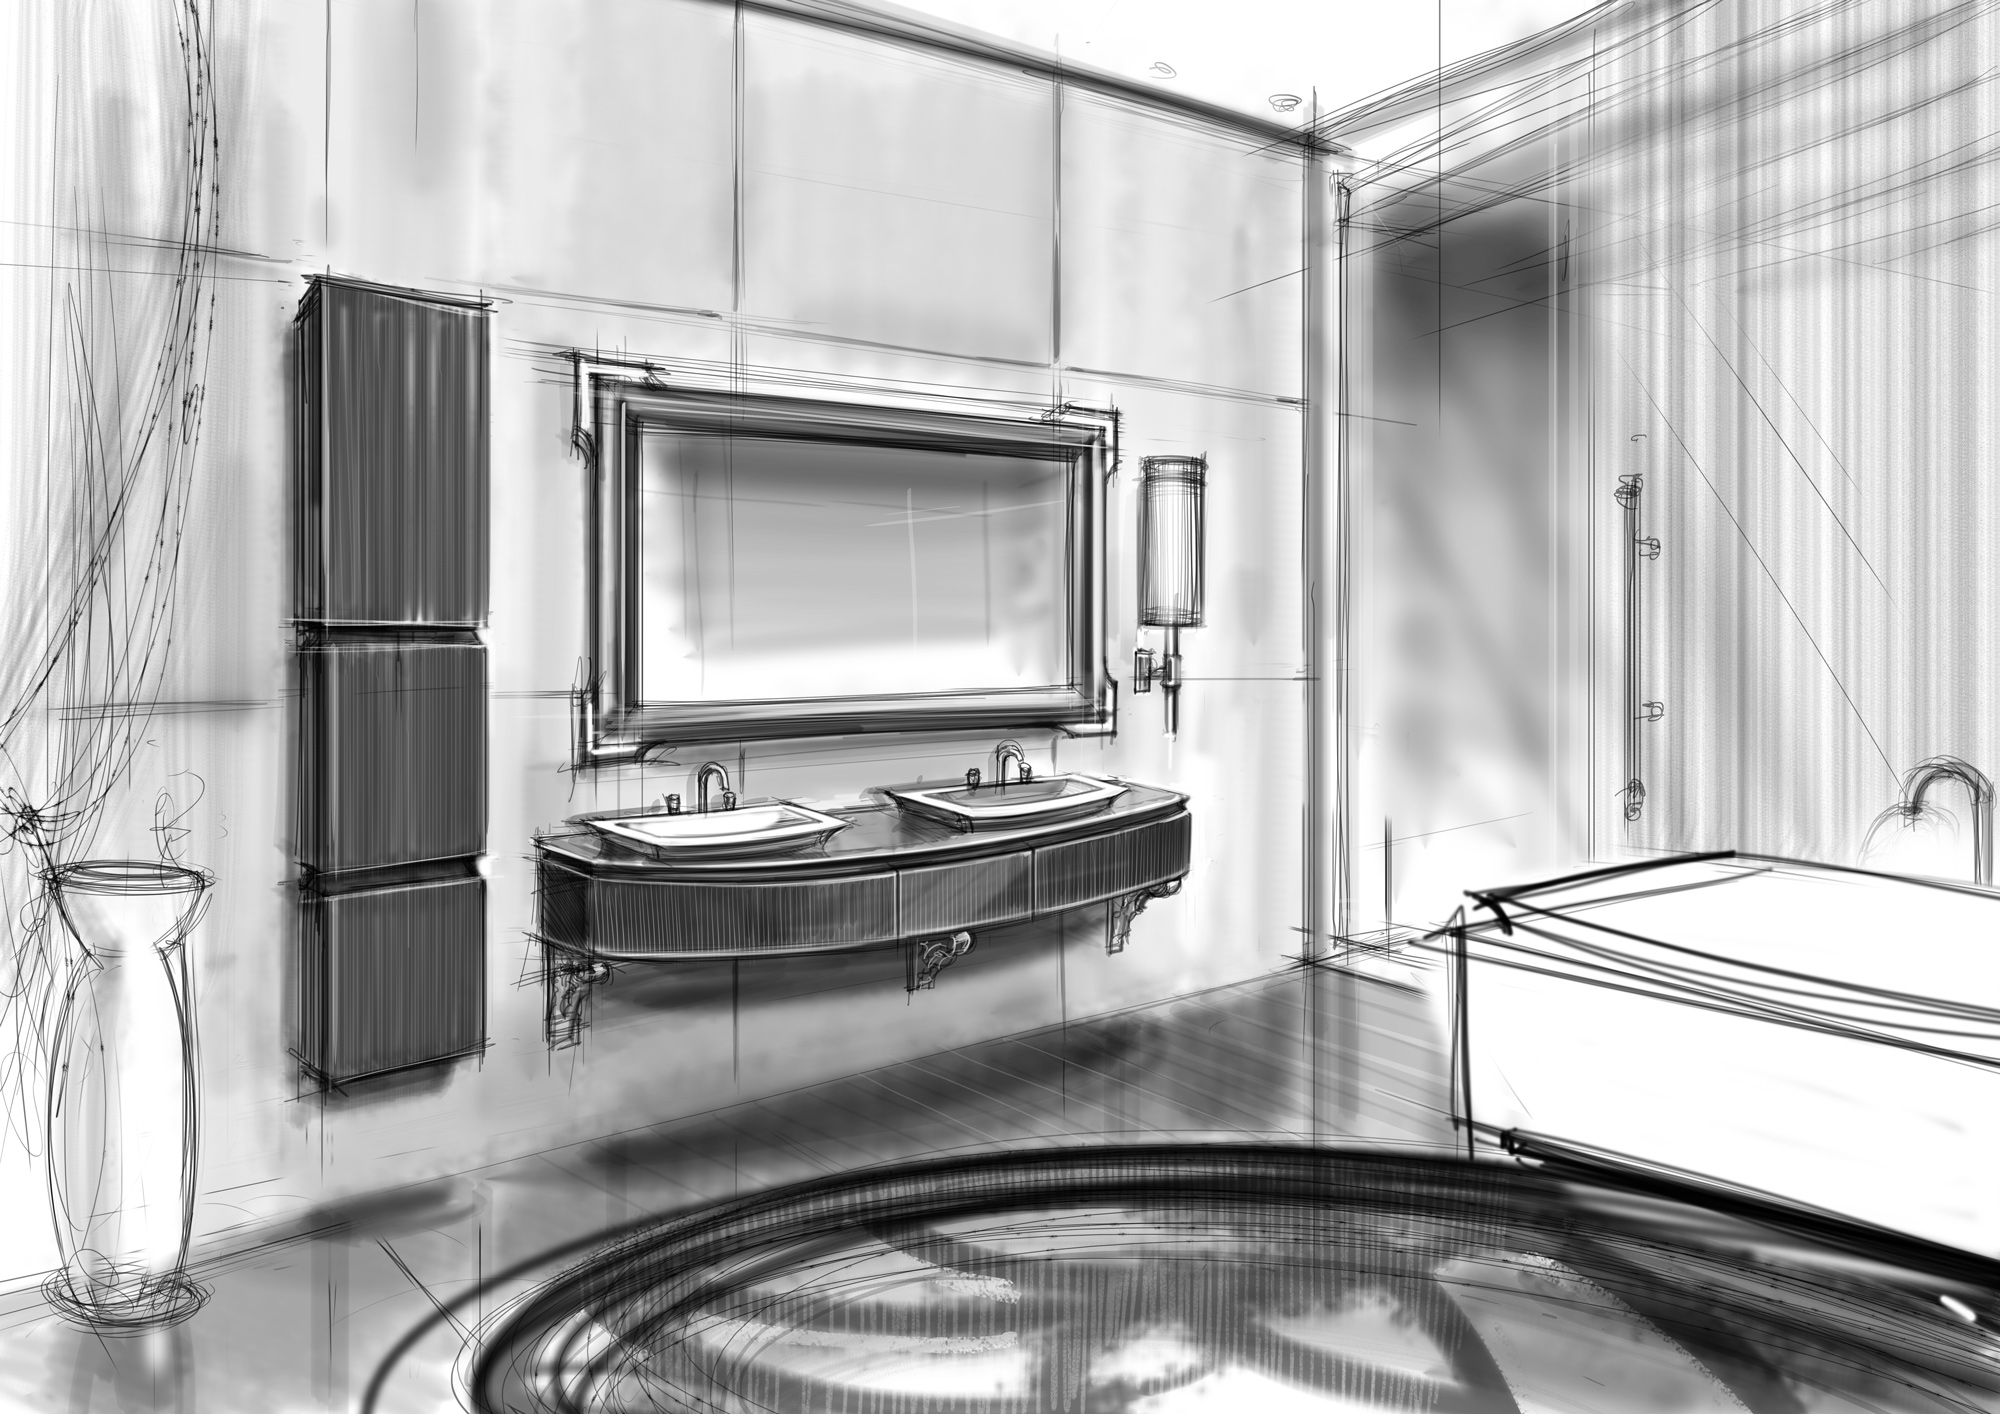 karol-sketching-m6.jpg